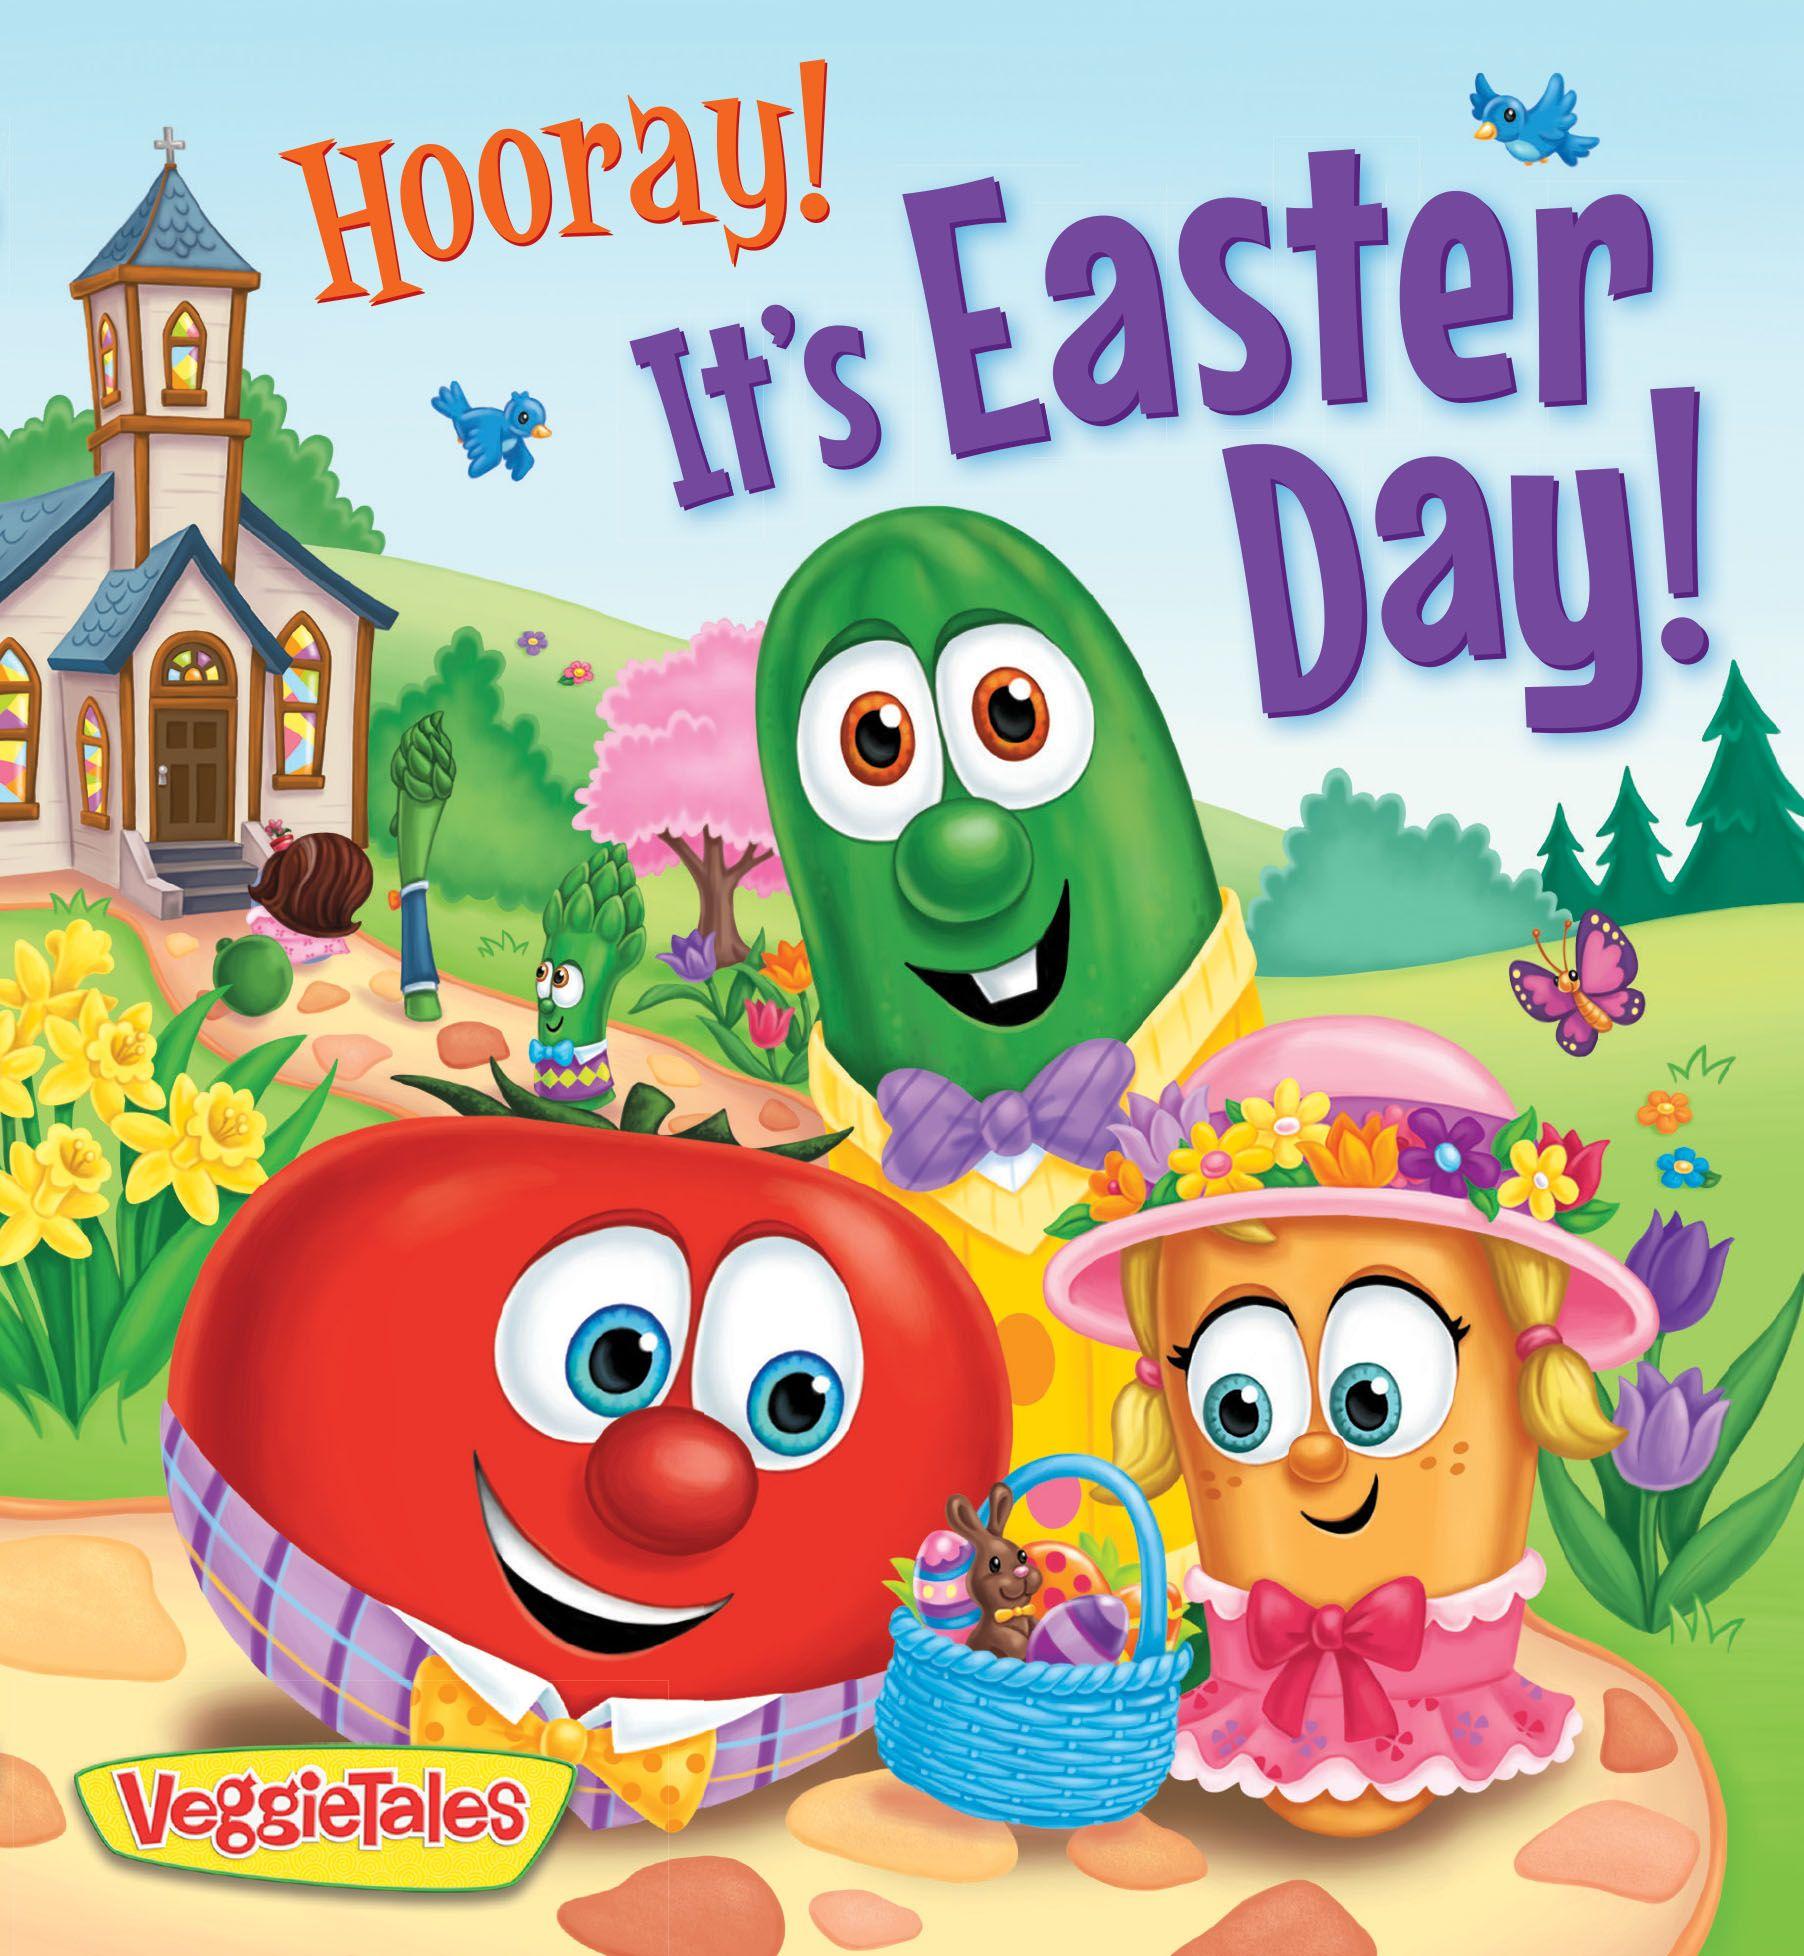 Veggietales Hooray It S Easter Day Veggietales Easter Books Easter Colouring